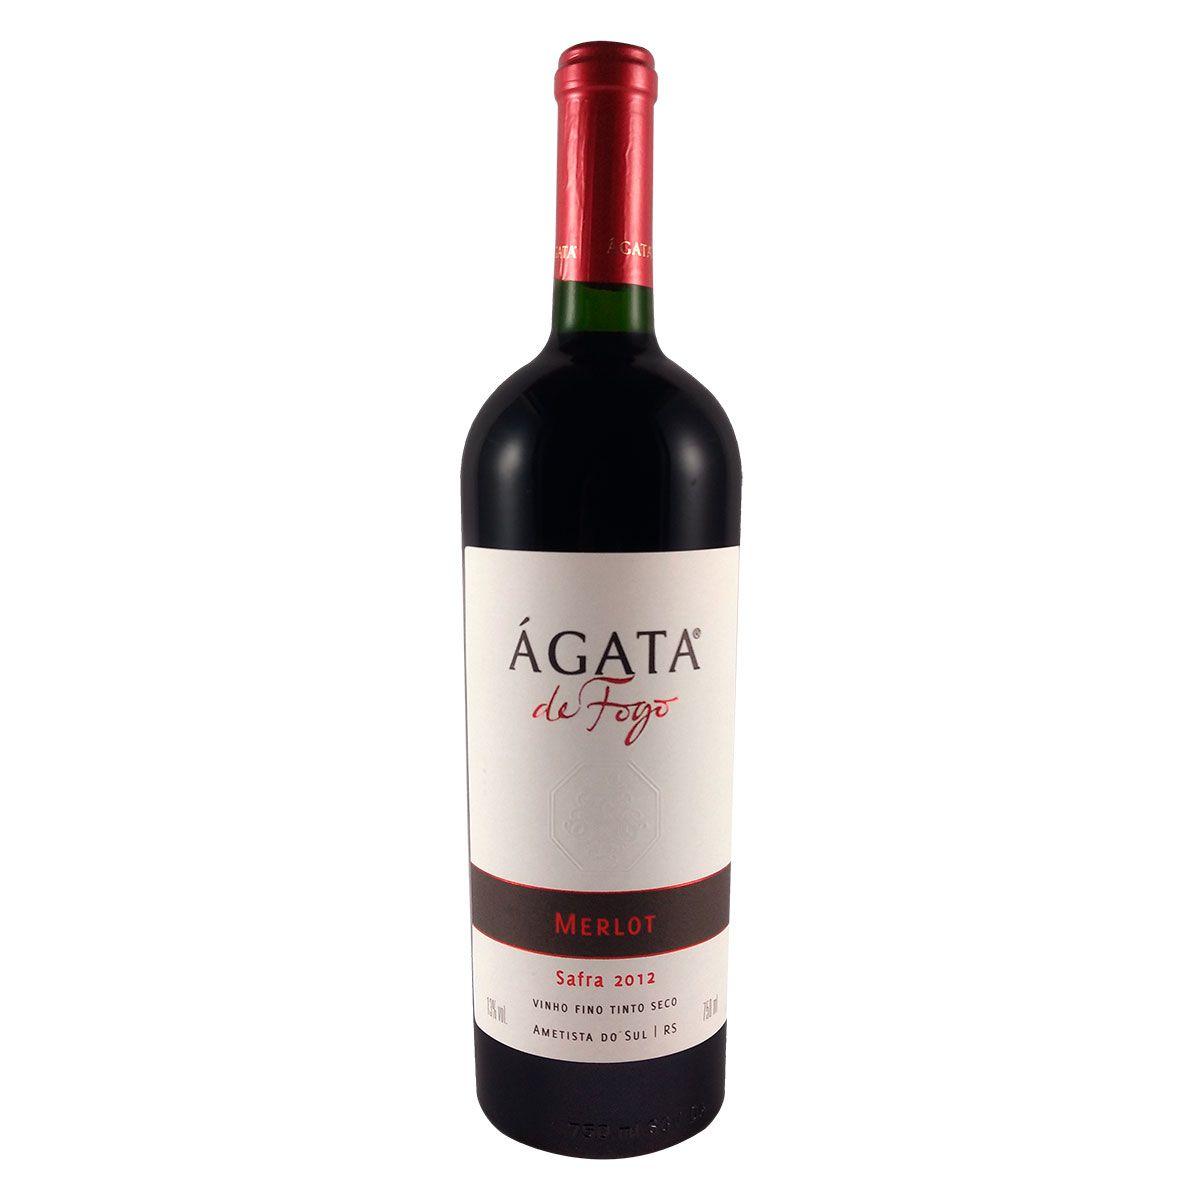 Vinho Fino Tinto Seco Ágata de Fogo Merlot 2012 750ml